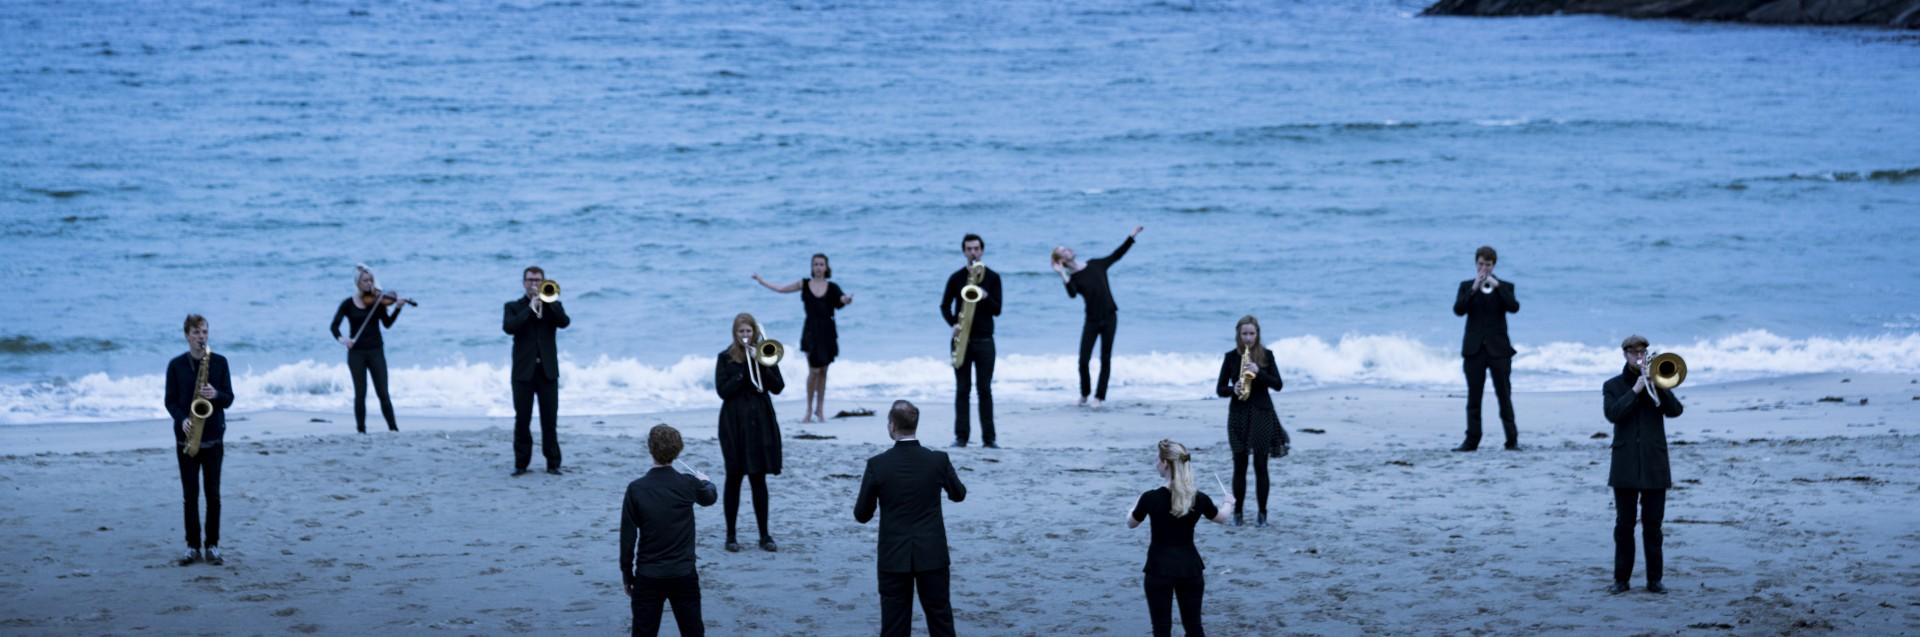 Students at Vigdel beach, Studenter på Vigdelstranden